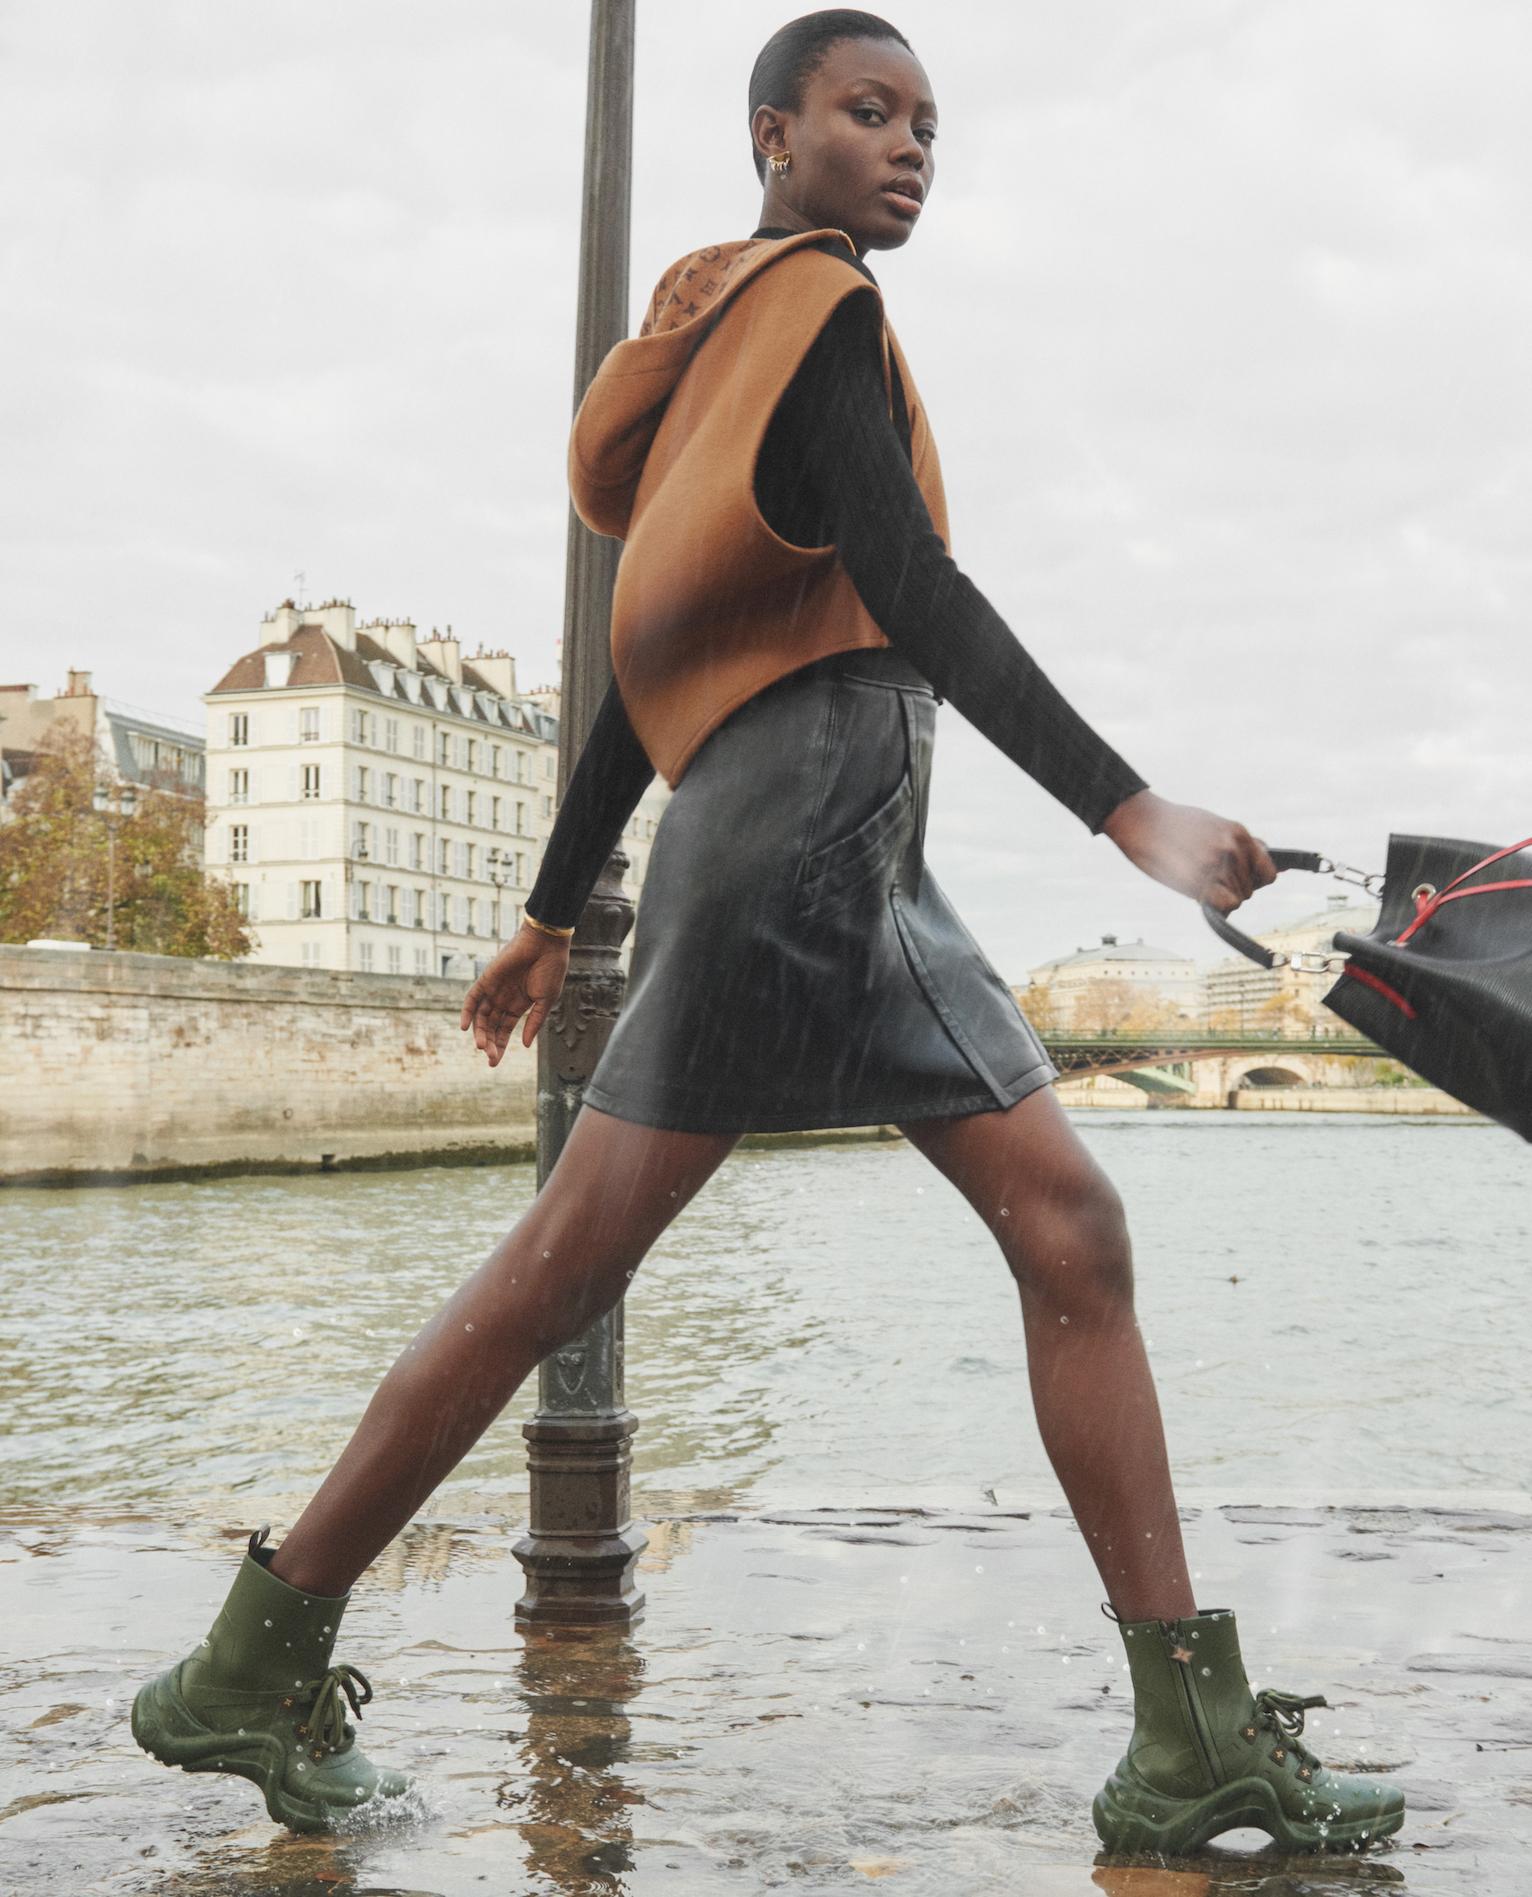 The Louis Vuitton Rain collection - Archlight sneaker boots